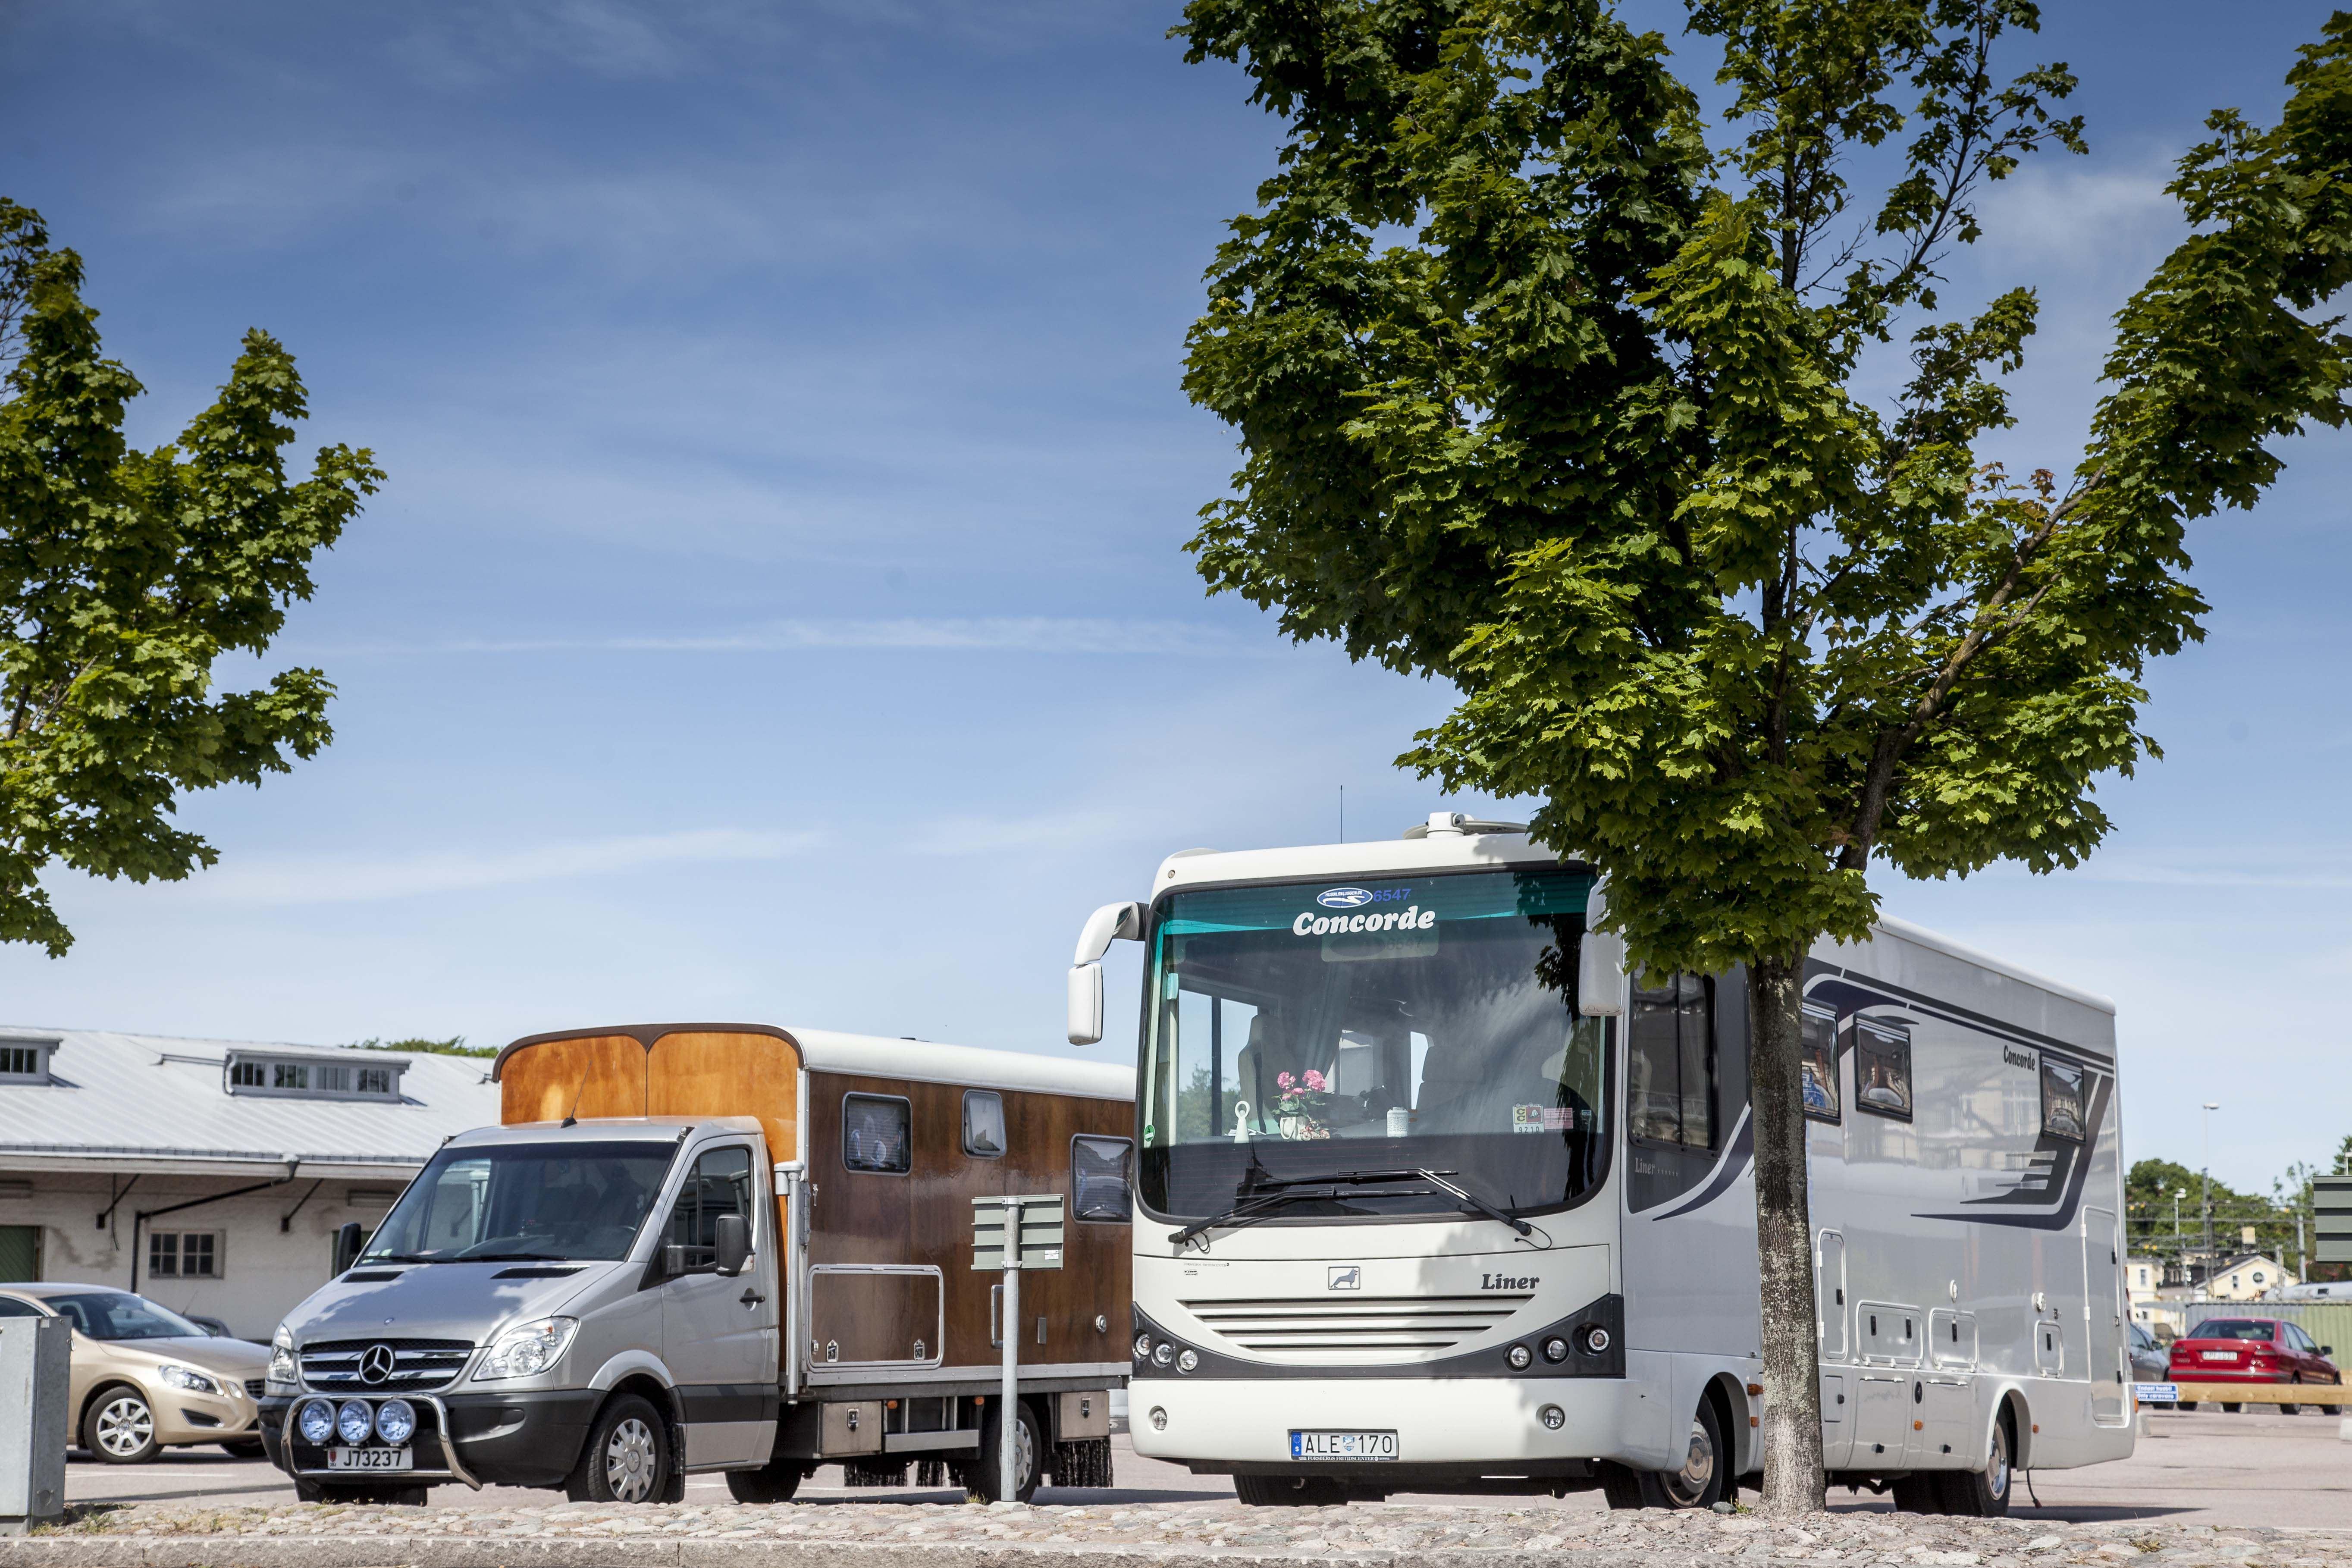 Marcus Funke, Camper parking in Kalmar